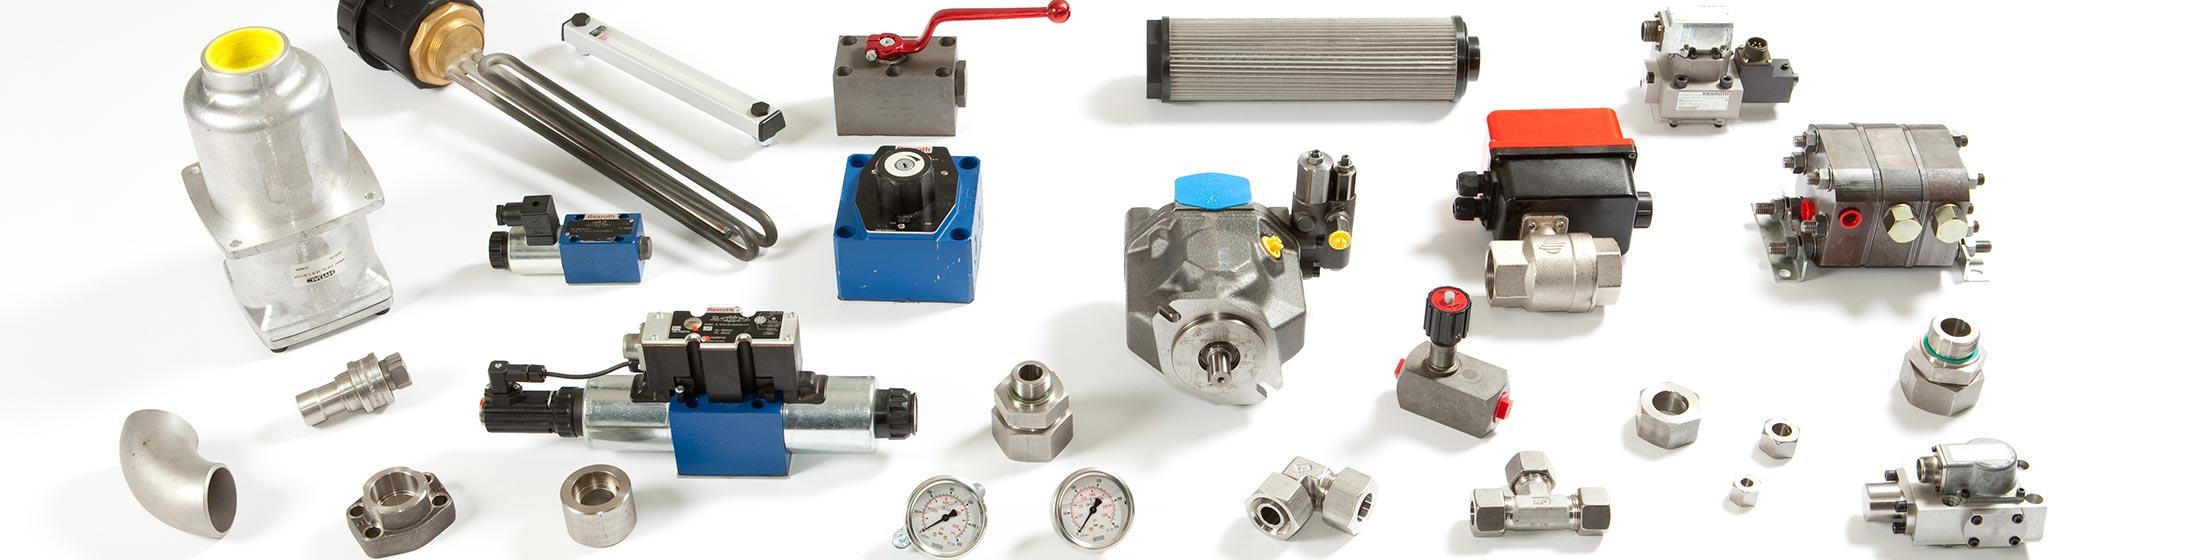 Sales components